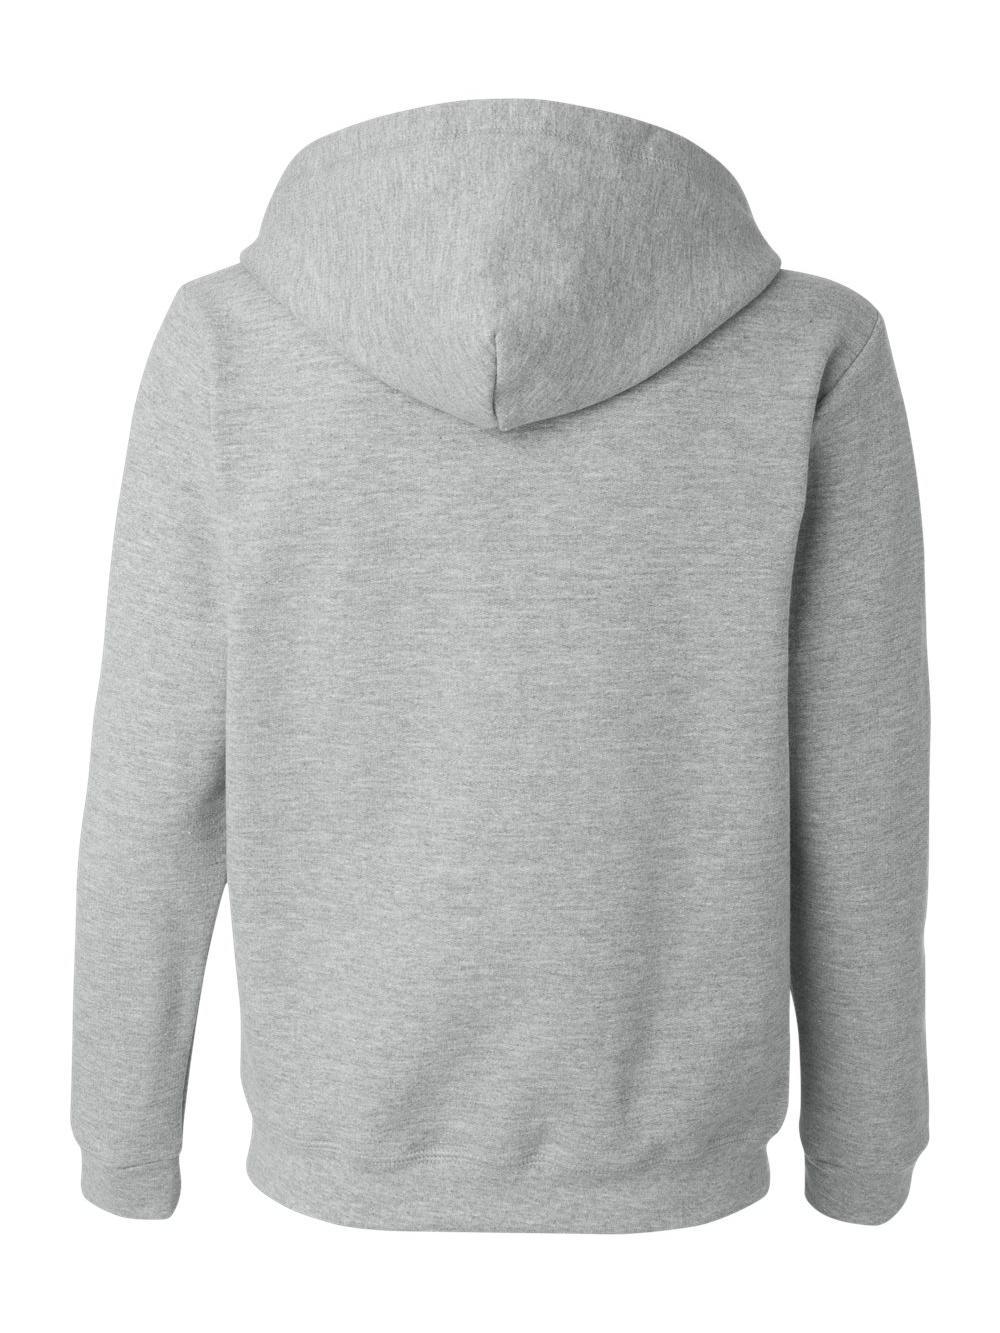 Gildan-Heavy-Blend-Women-039-s-Full-Zip-Hooded-Sweatshirt-18600FL thumbnail 13